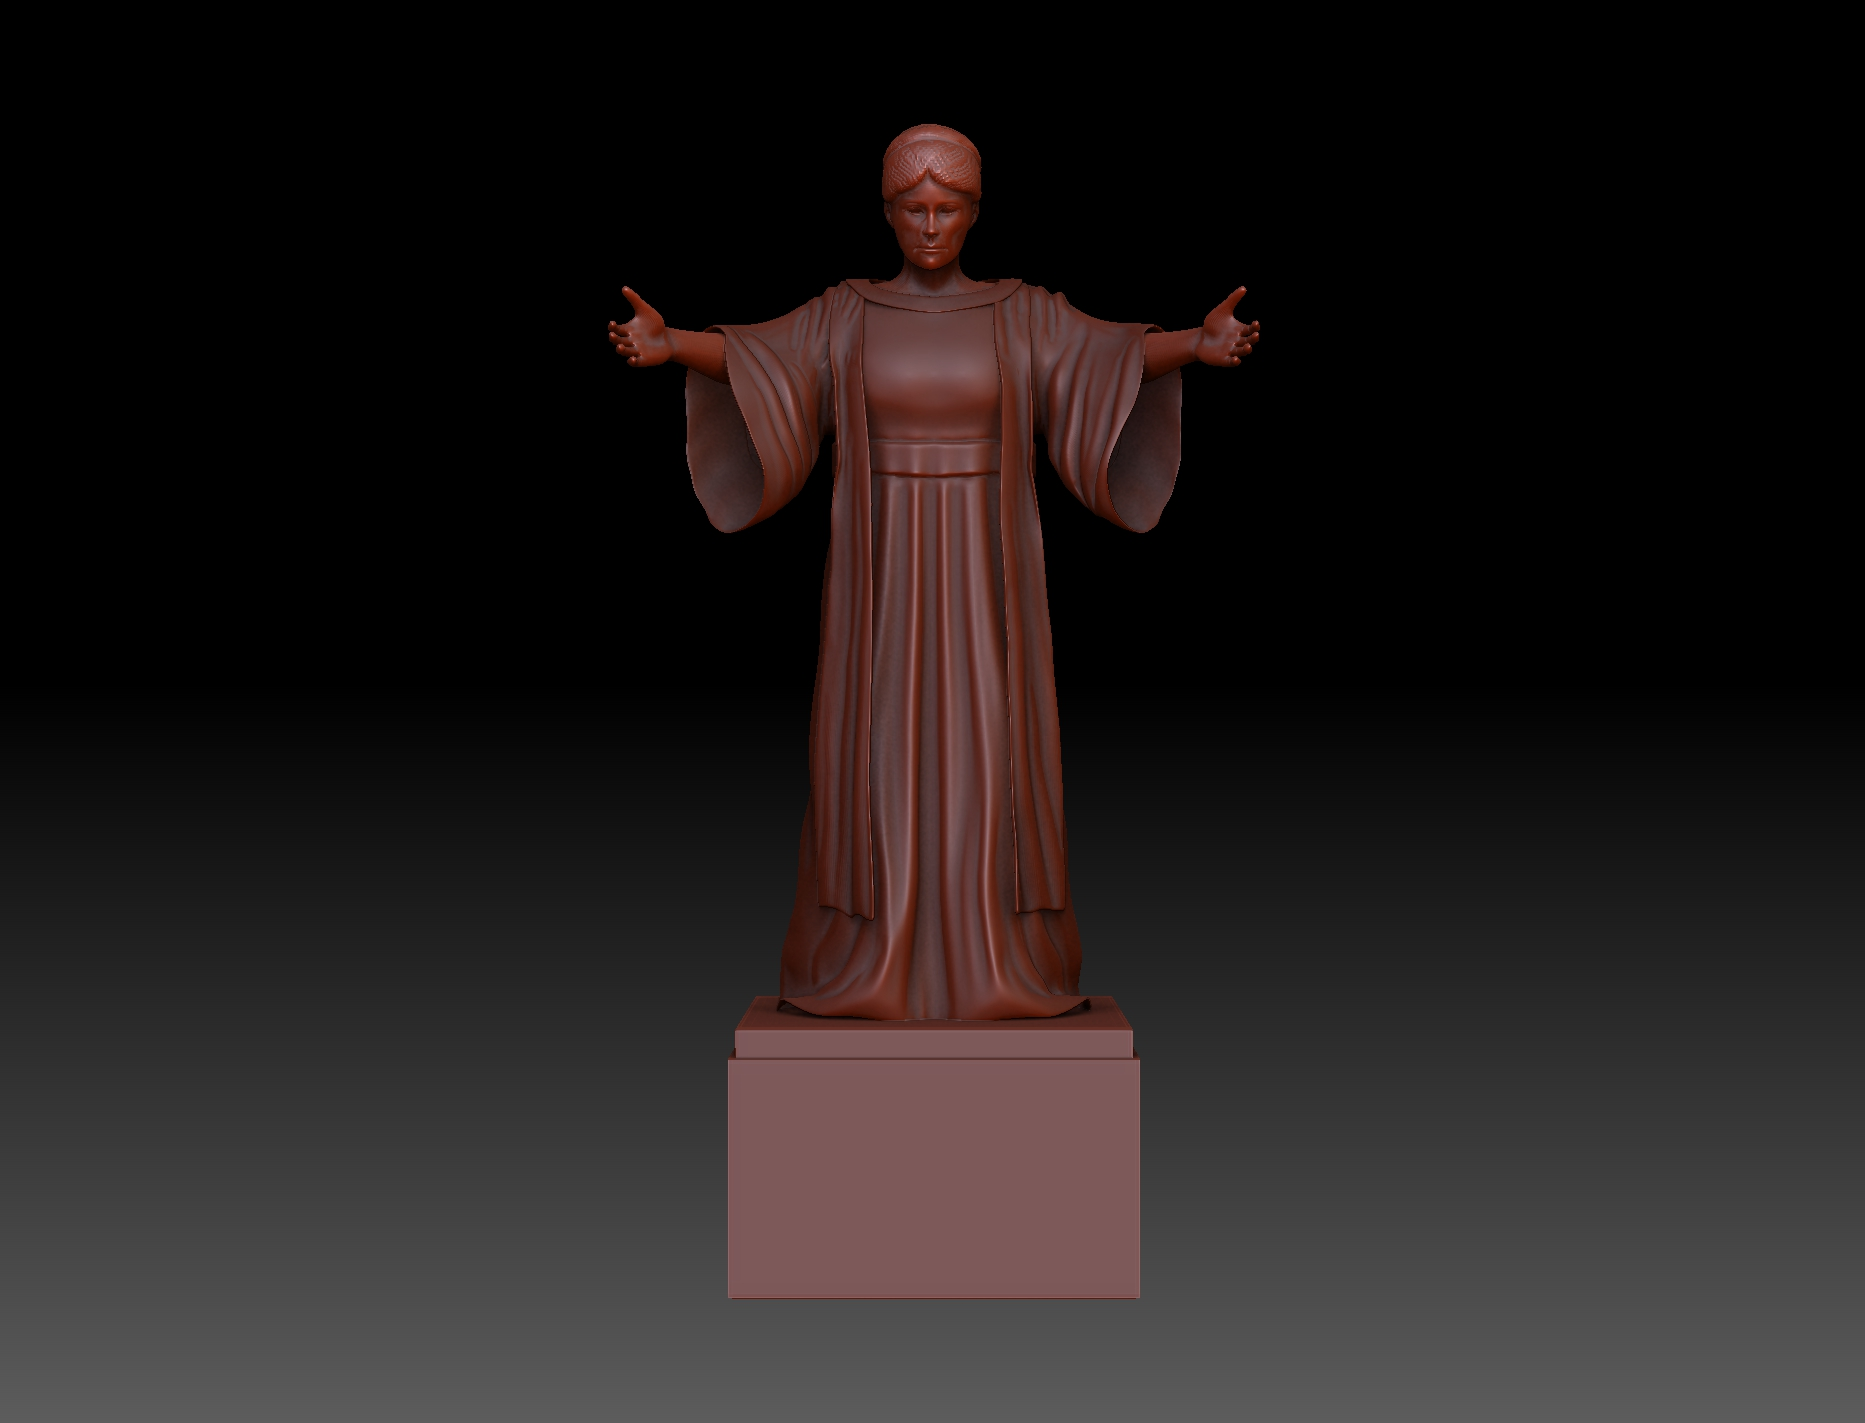 alma_mater_statue_render_v001.jpg